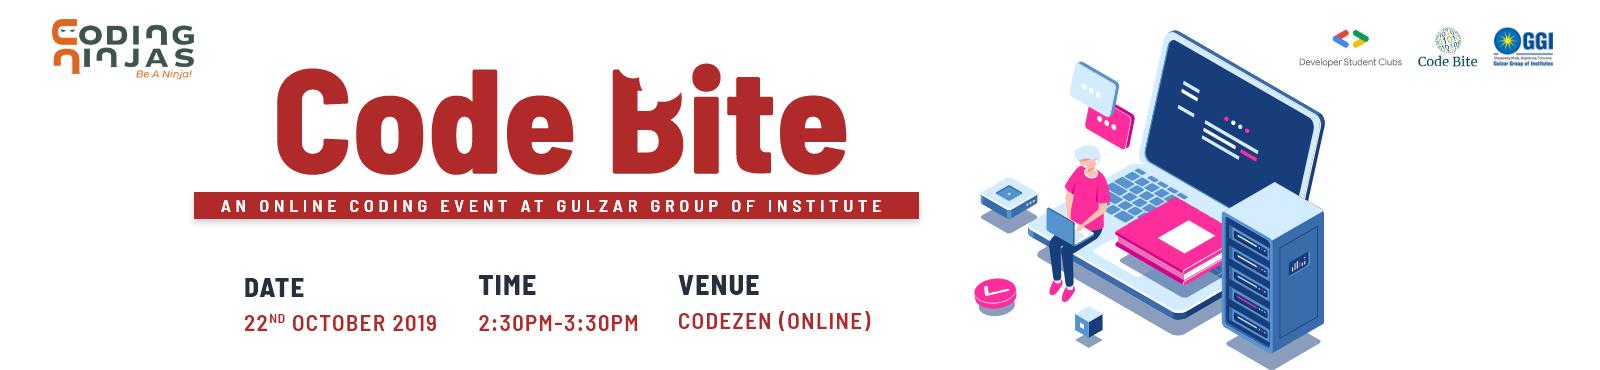 Code Bite- An online Coding event